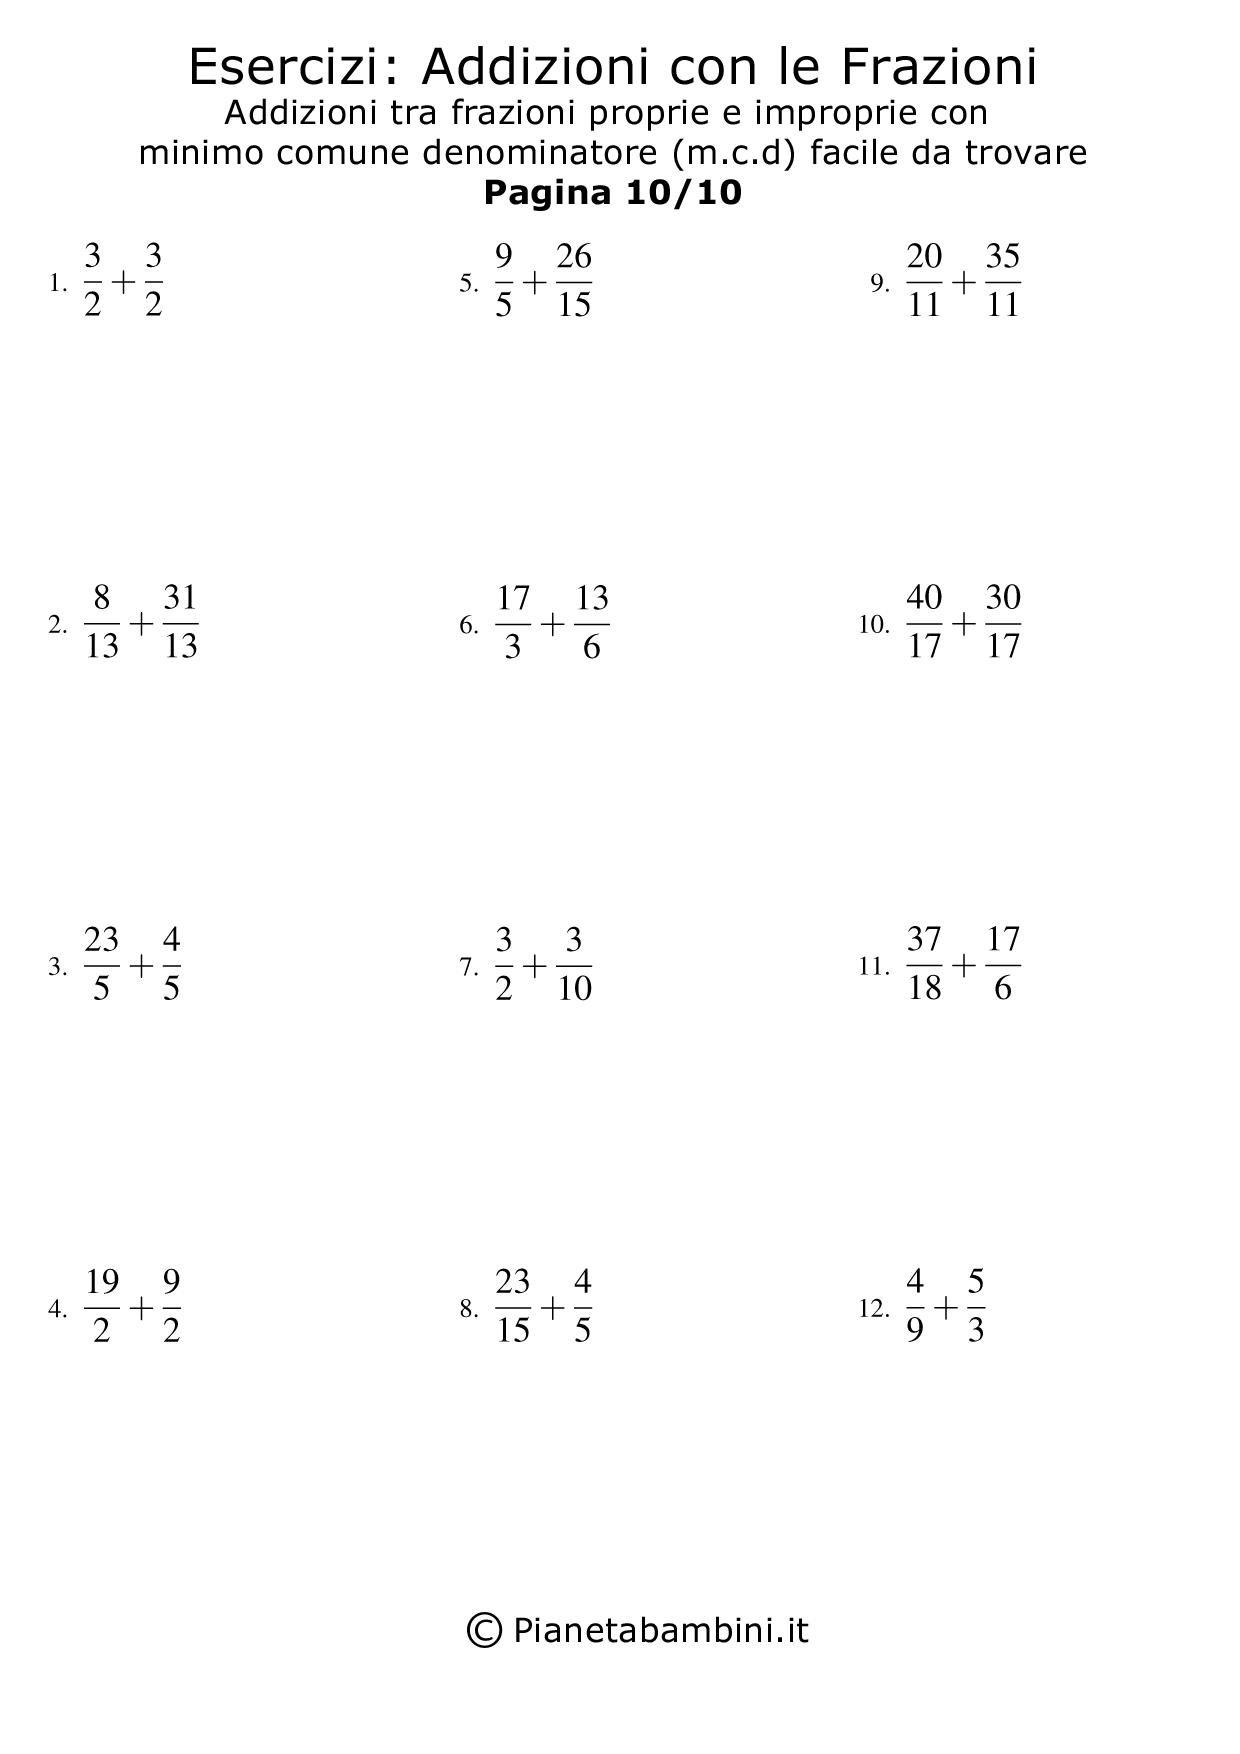 Frazioni-Prorpie-Improprie-m.c.d-Facile_10